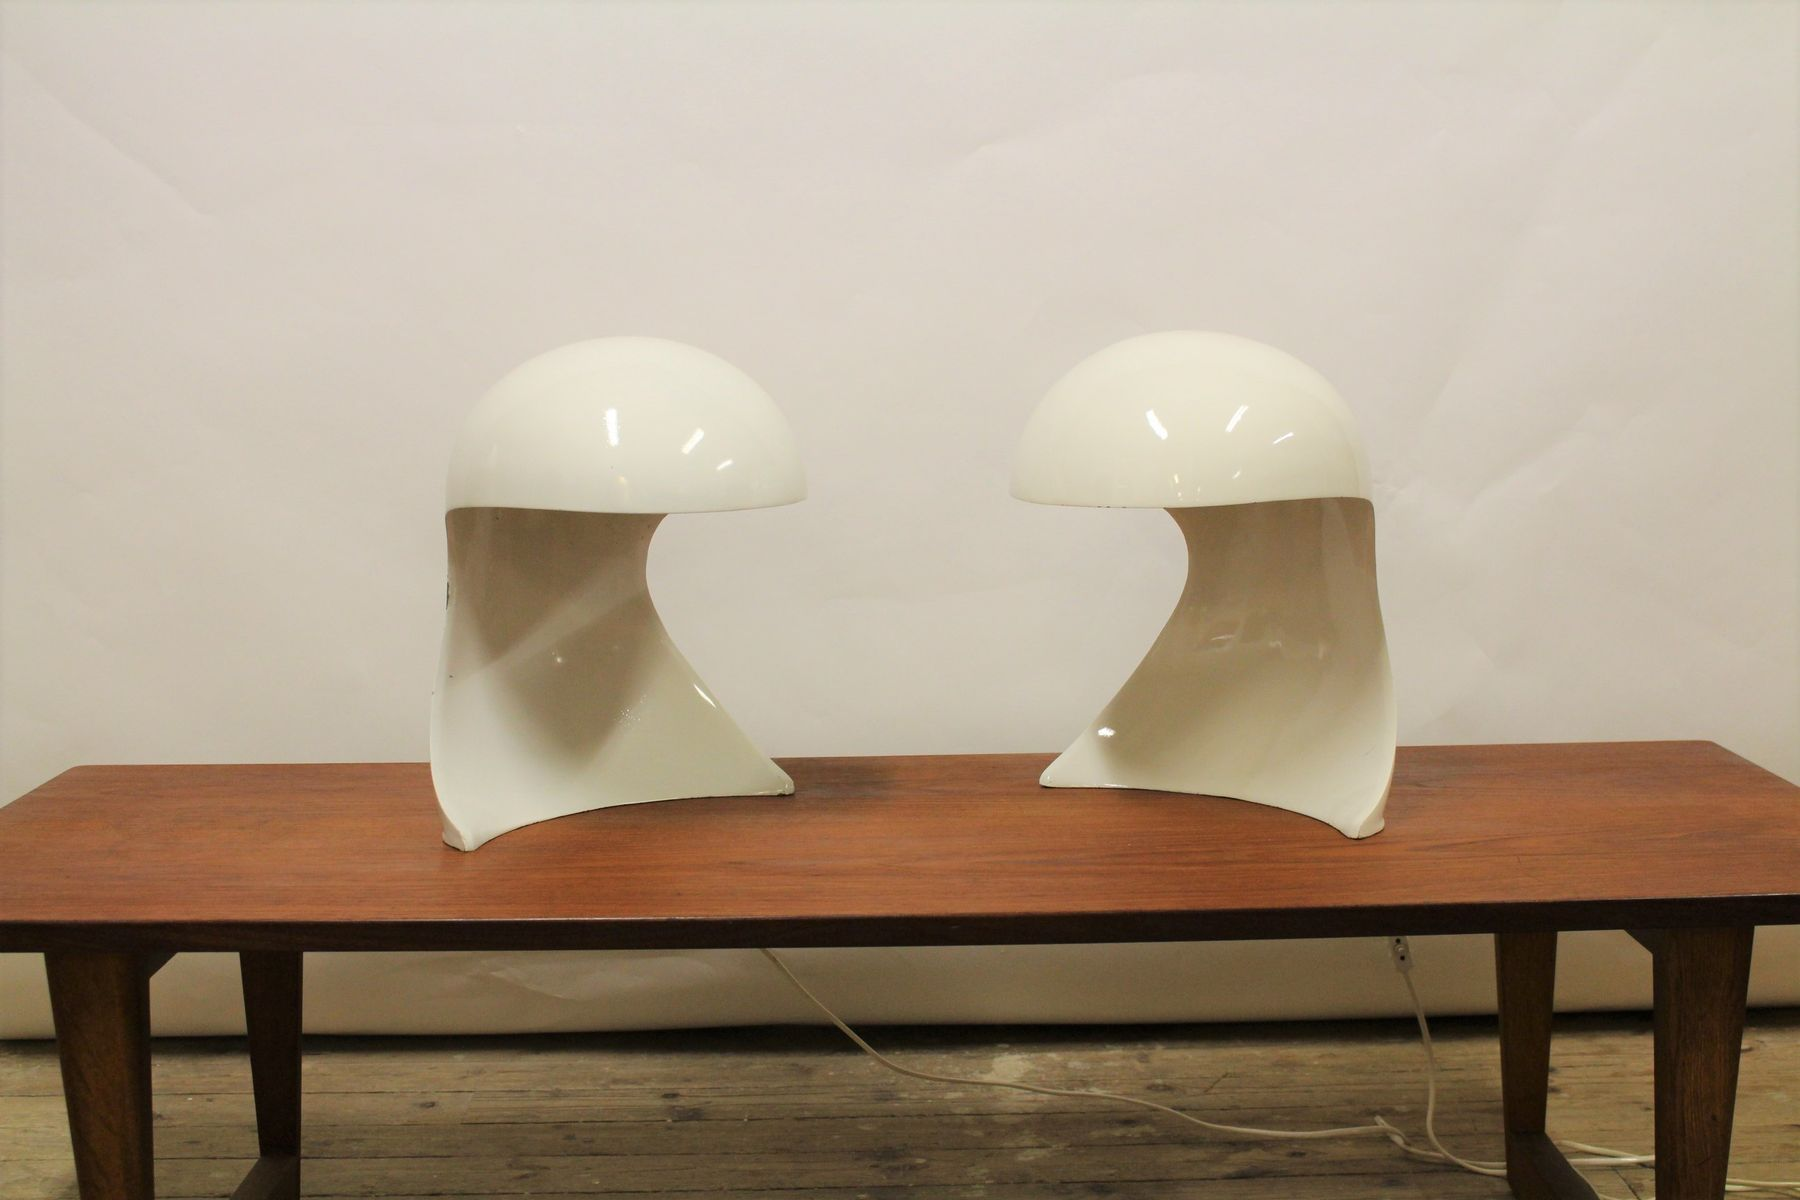 Lampe de bureau par dario tognon studio celli pour artemide